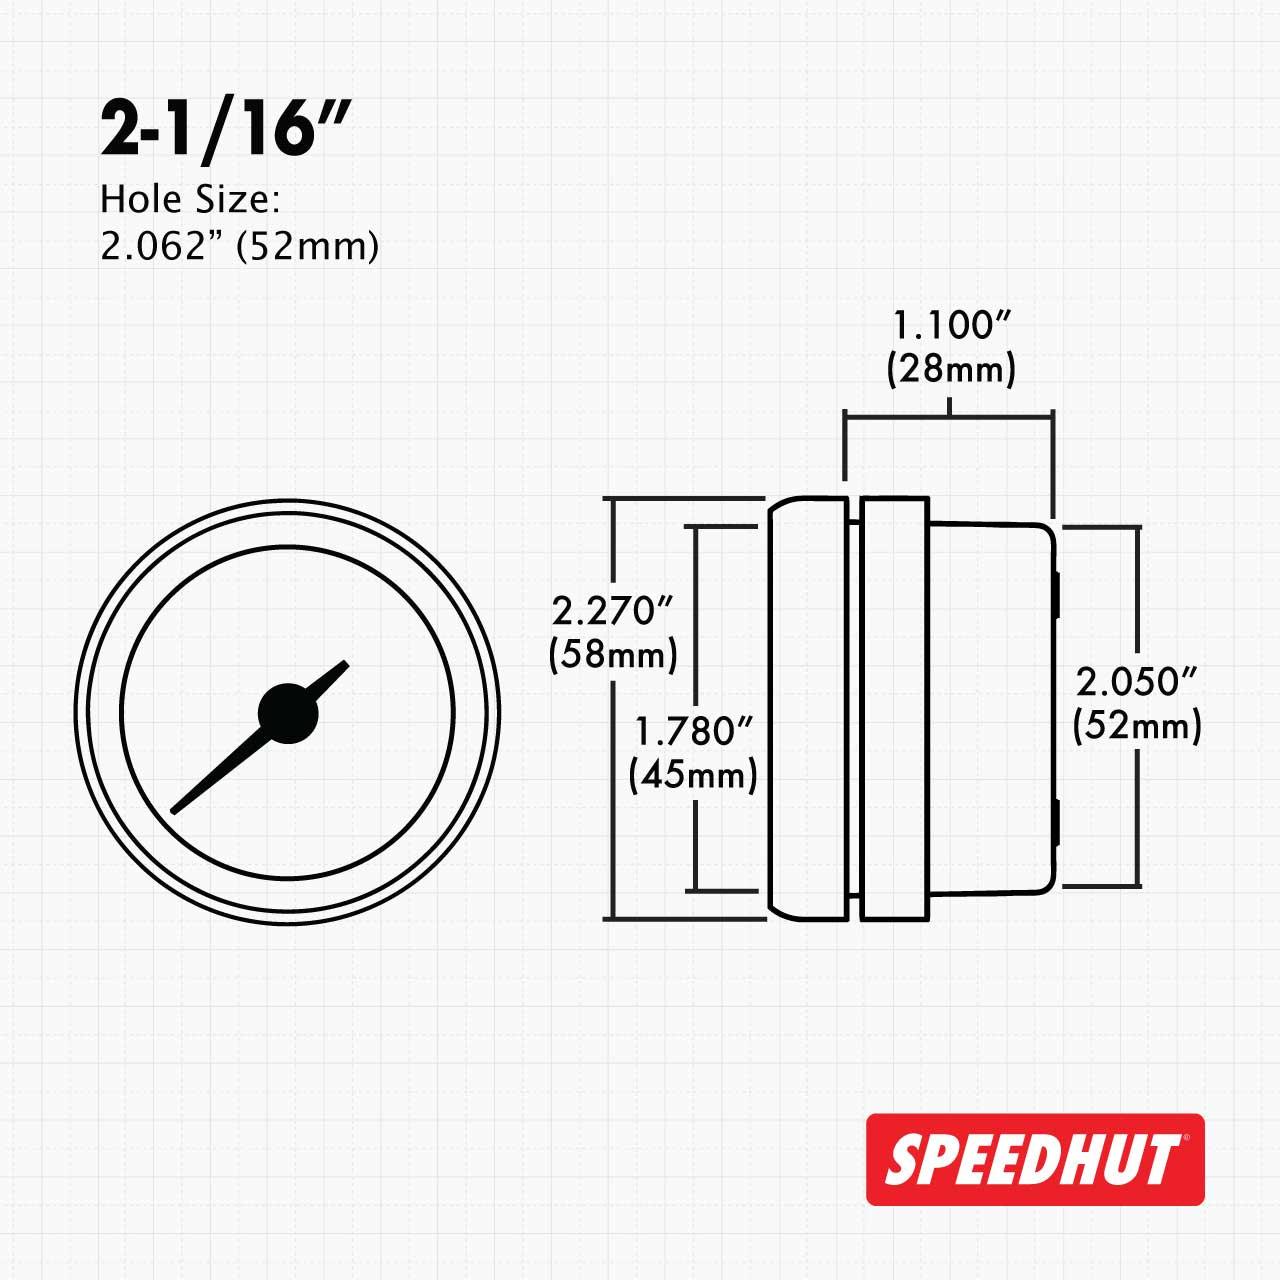 "2-1/16"" CJ Jeep Oil Pressure Gauge 0-100psi"